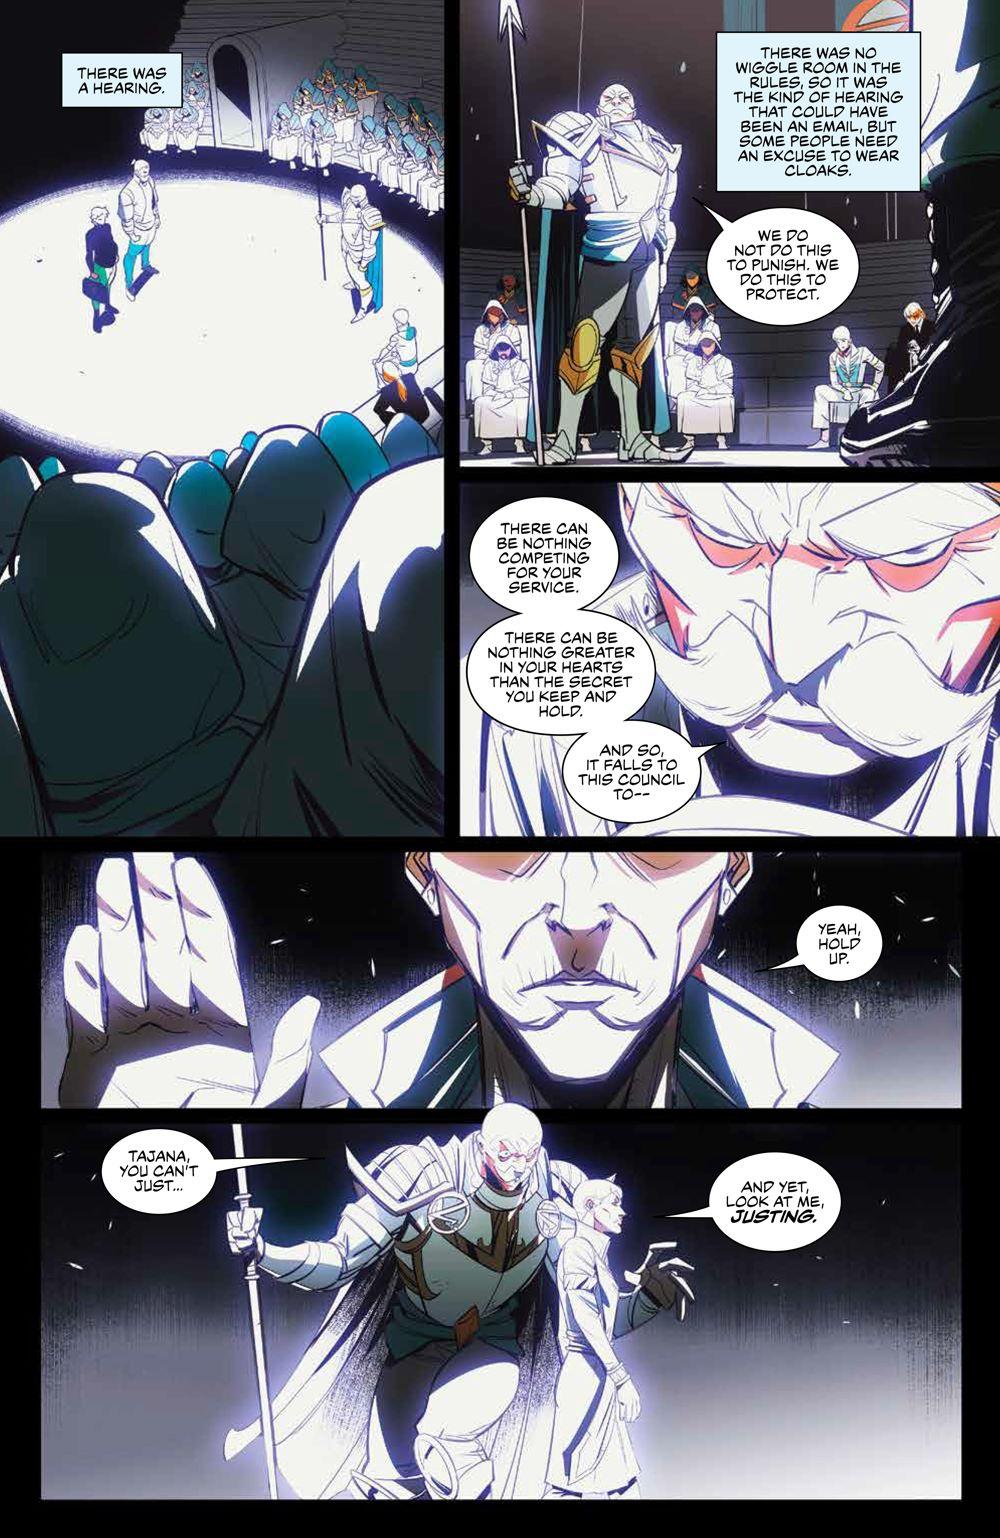 SevenSecrets_v1_SC_PRESS_18 ComicList Previews: SEVEN SECRETS VOLUME 1 TP